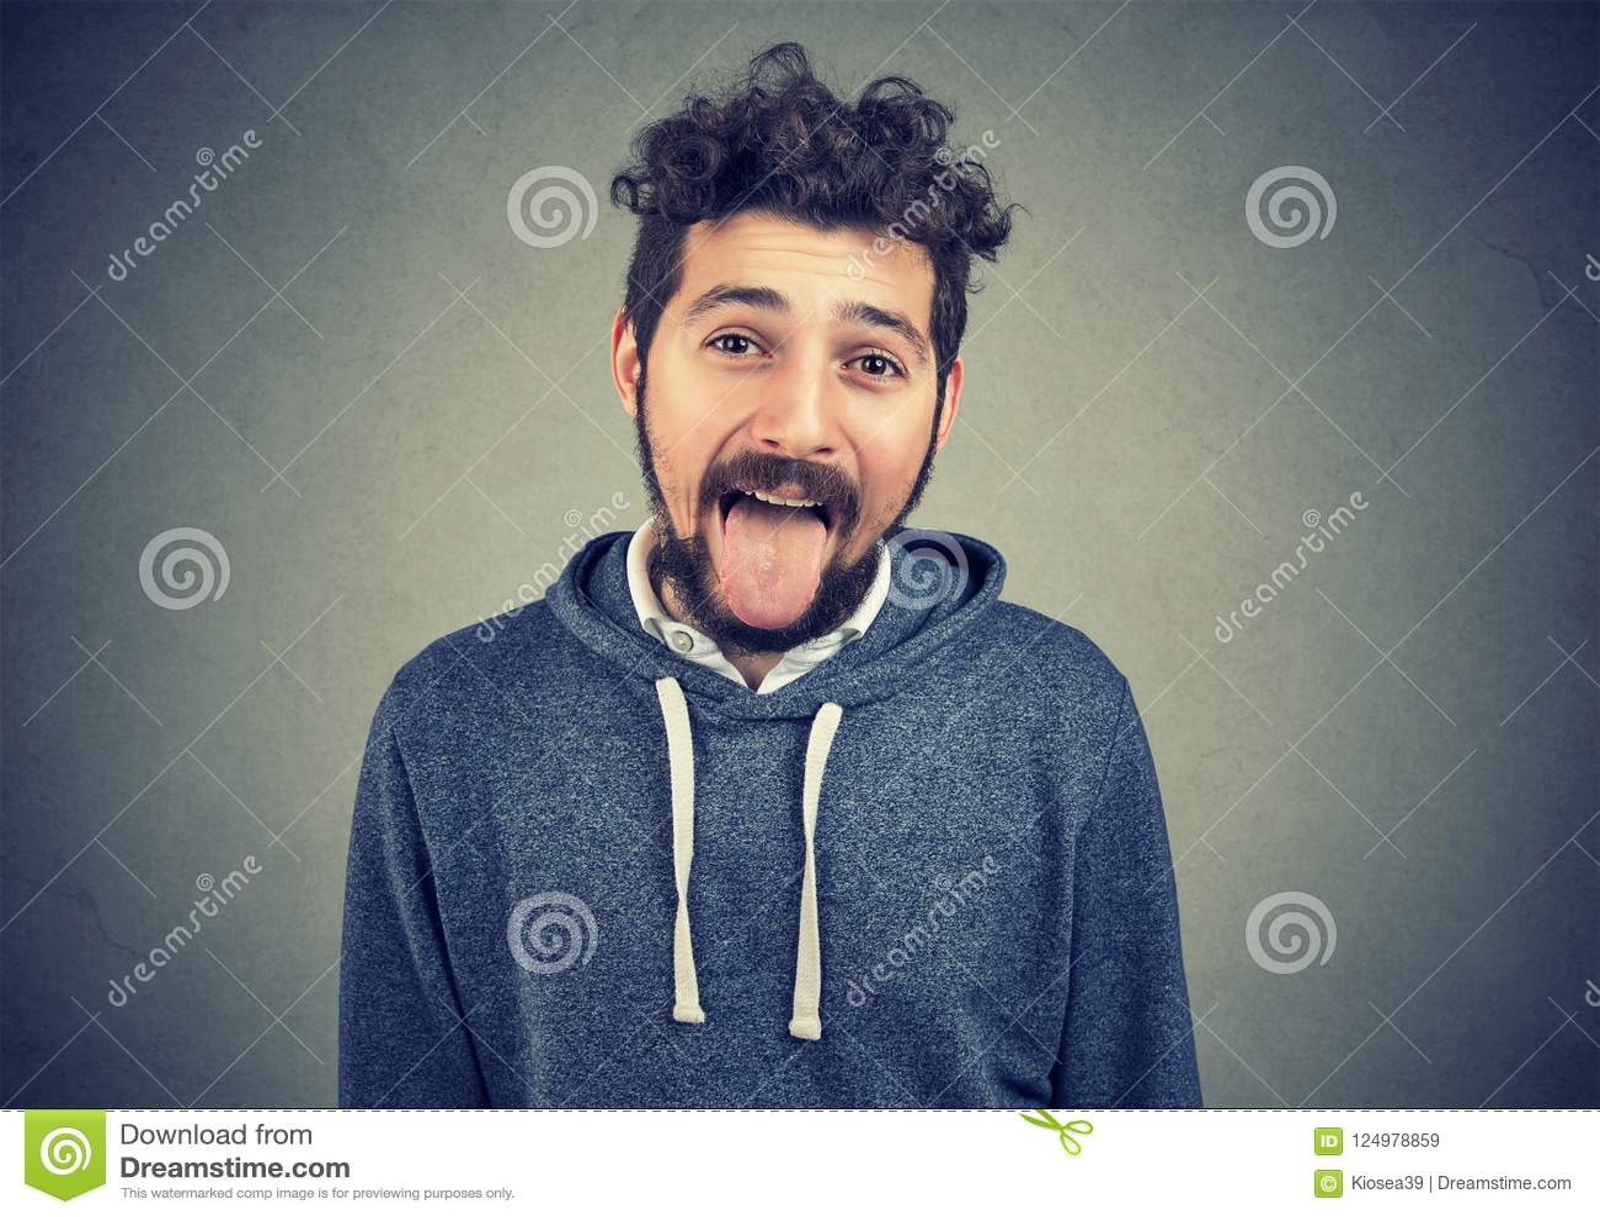 Childish Man Grimacing At Camera Sticking Out His Tongue